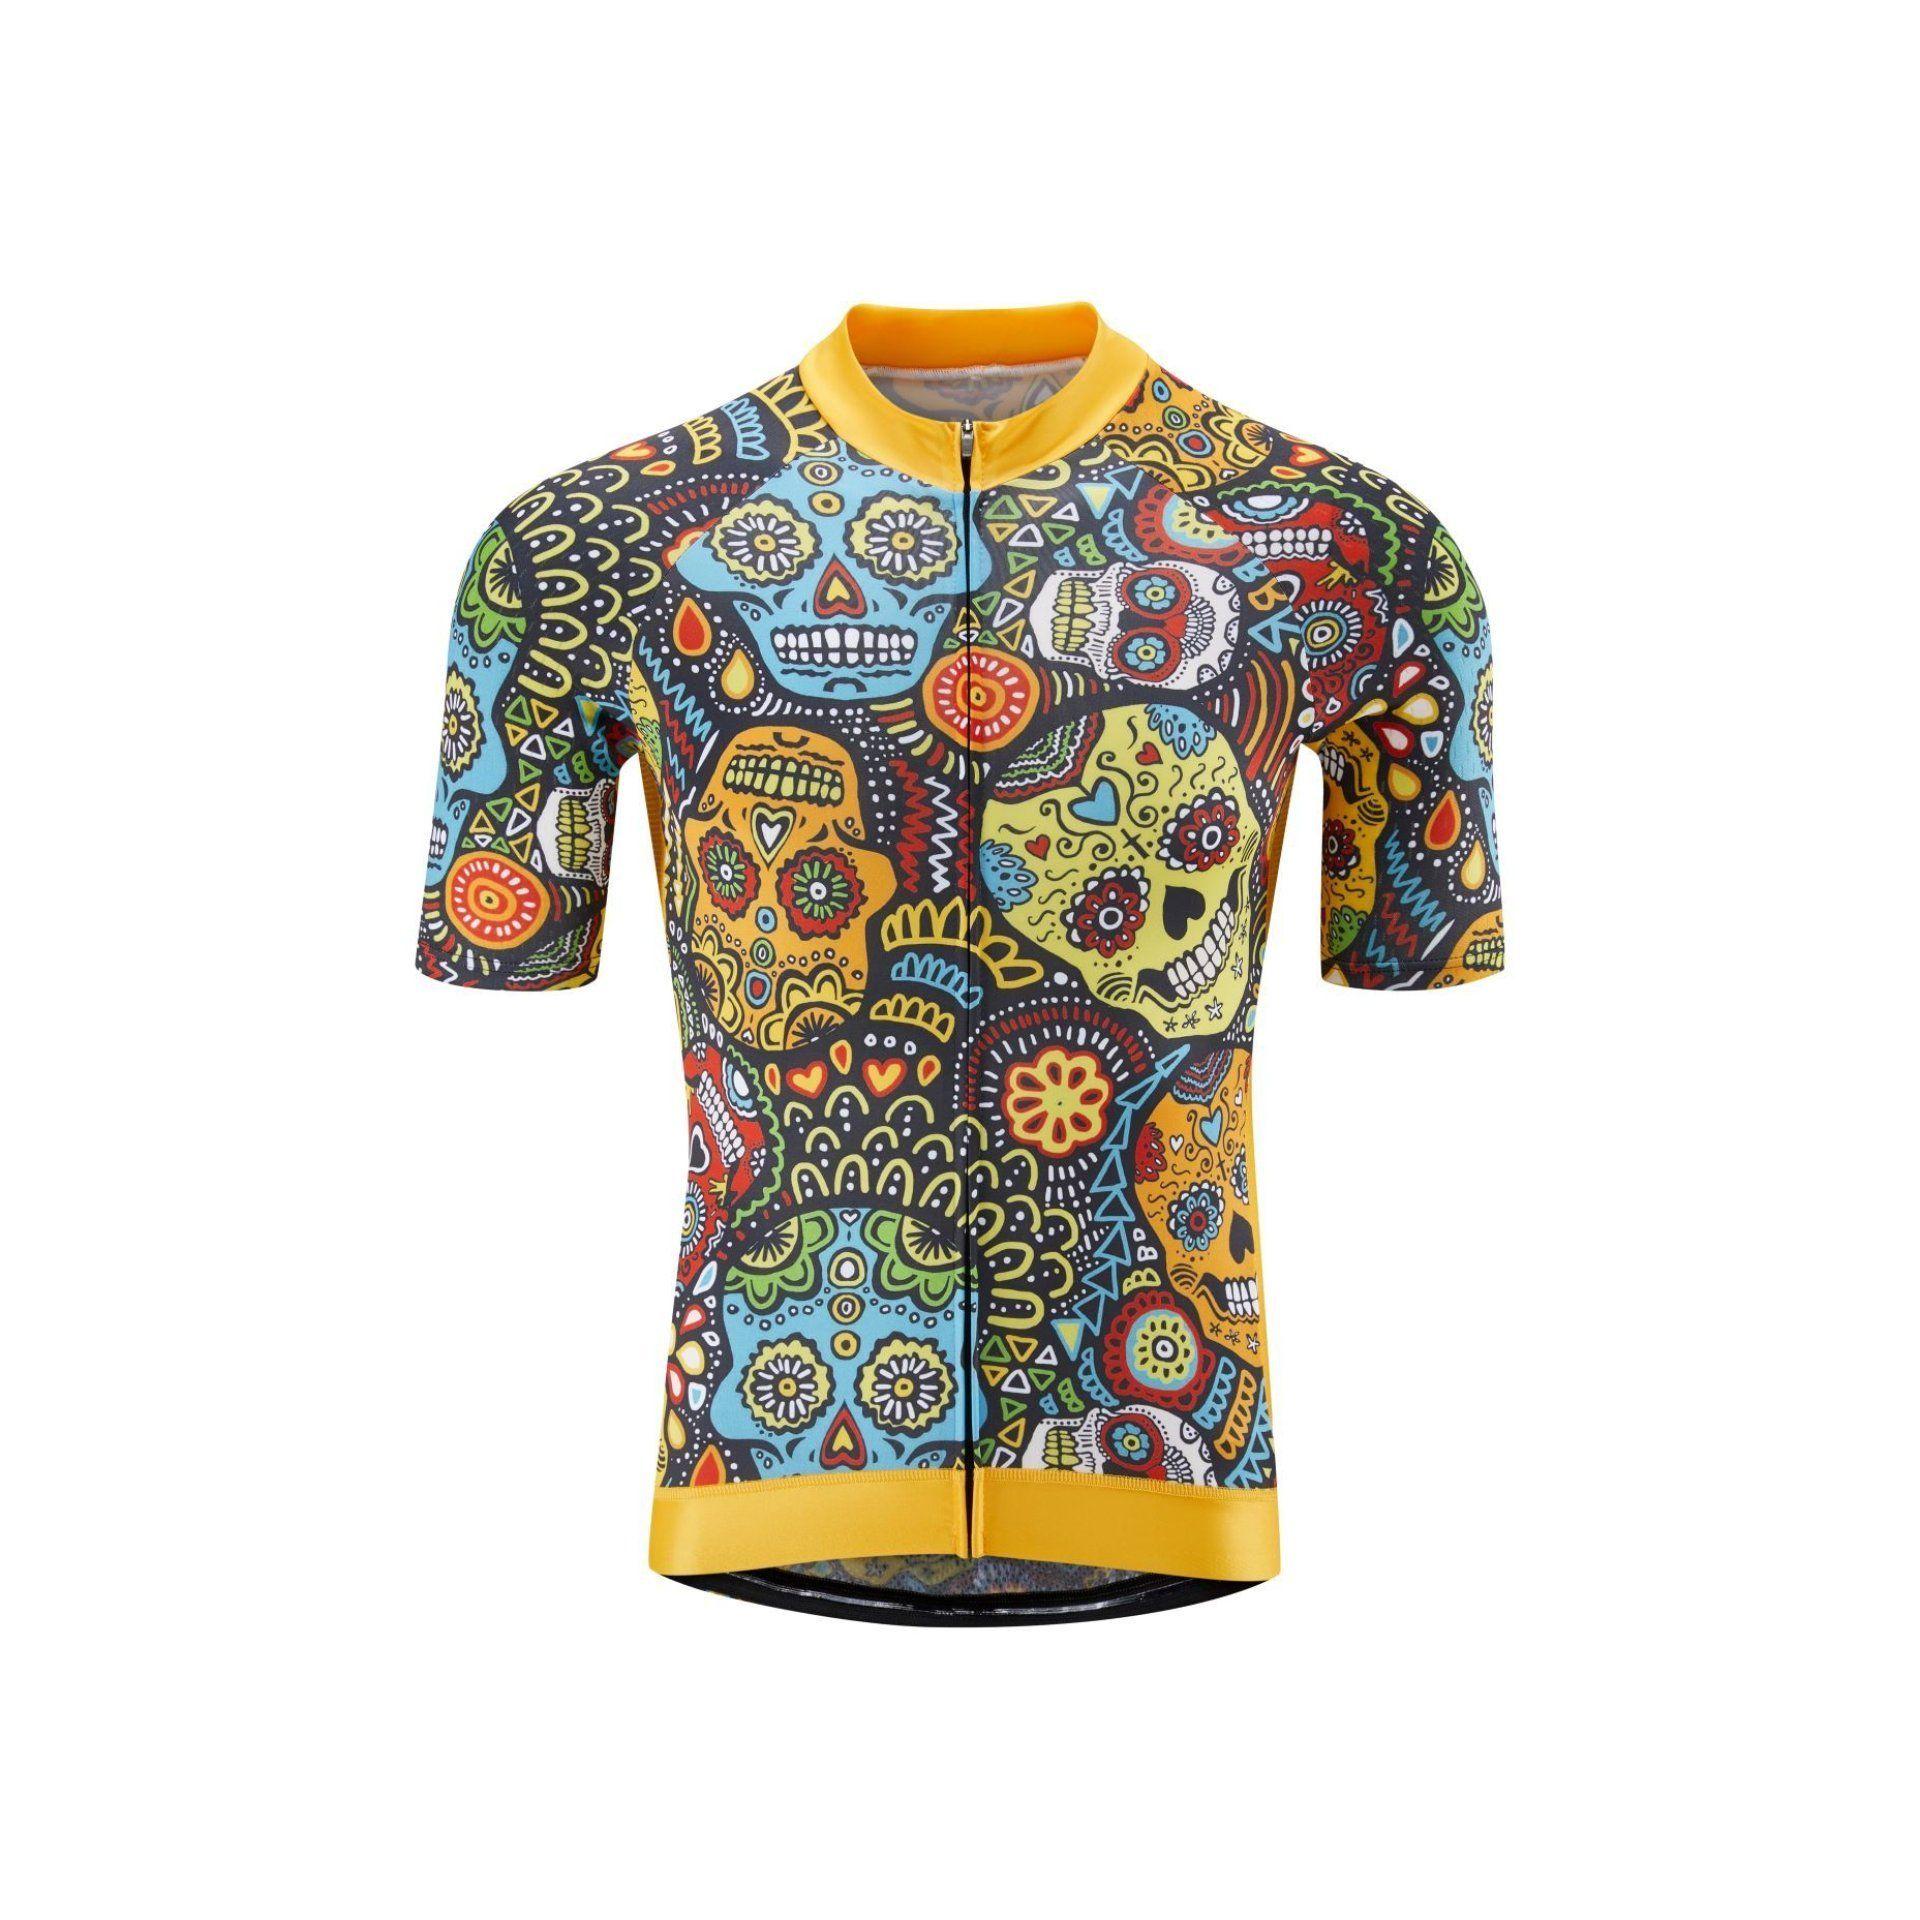 Mexican Candy Skull Jersey by Lusy Koror Cykelkläder